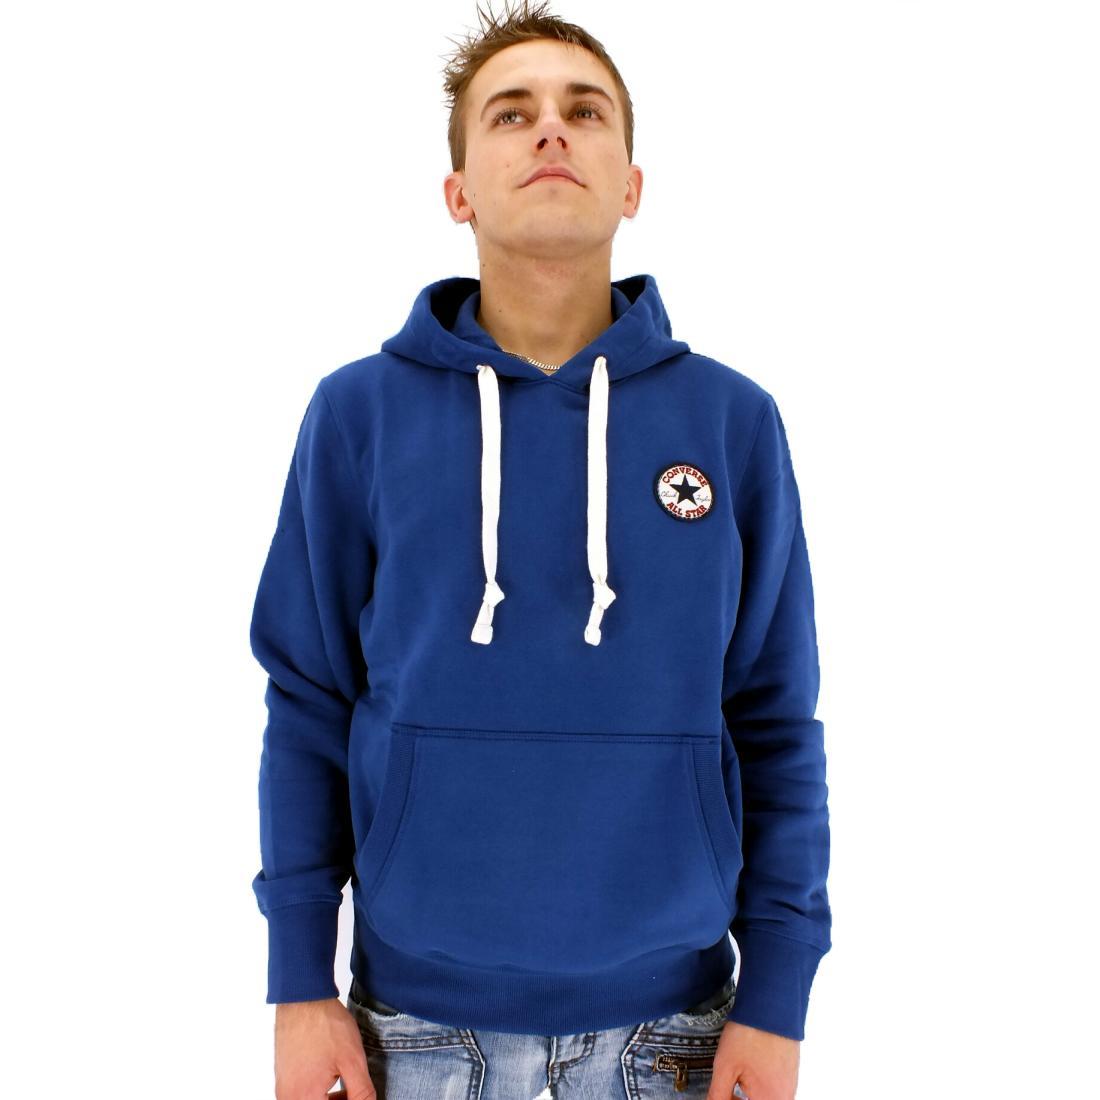 converse core c patch fleece po hoodie herren pullover kapuze diverse farben ebay. Black Bedroom Furniture Sets. Home Design Ideas